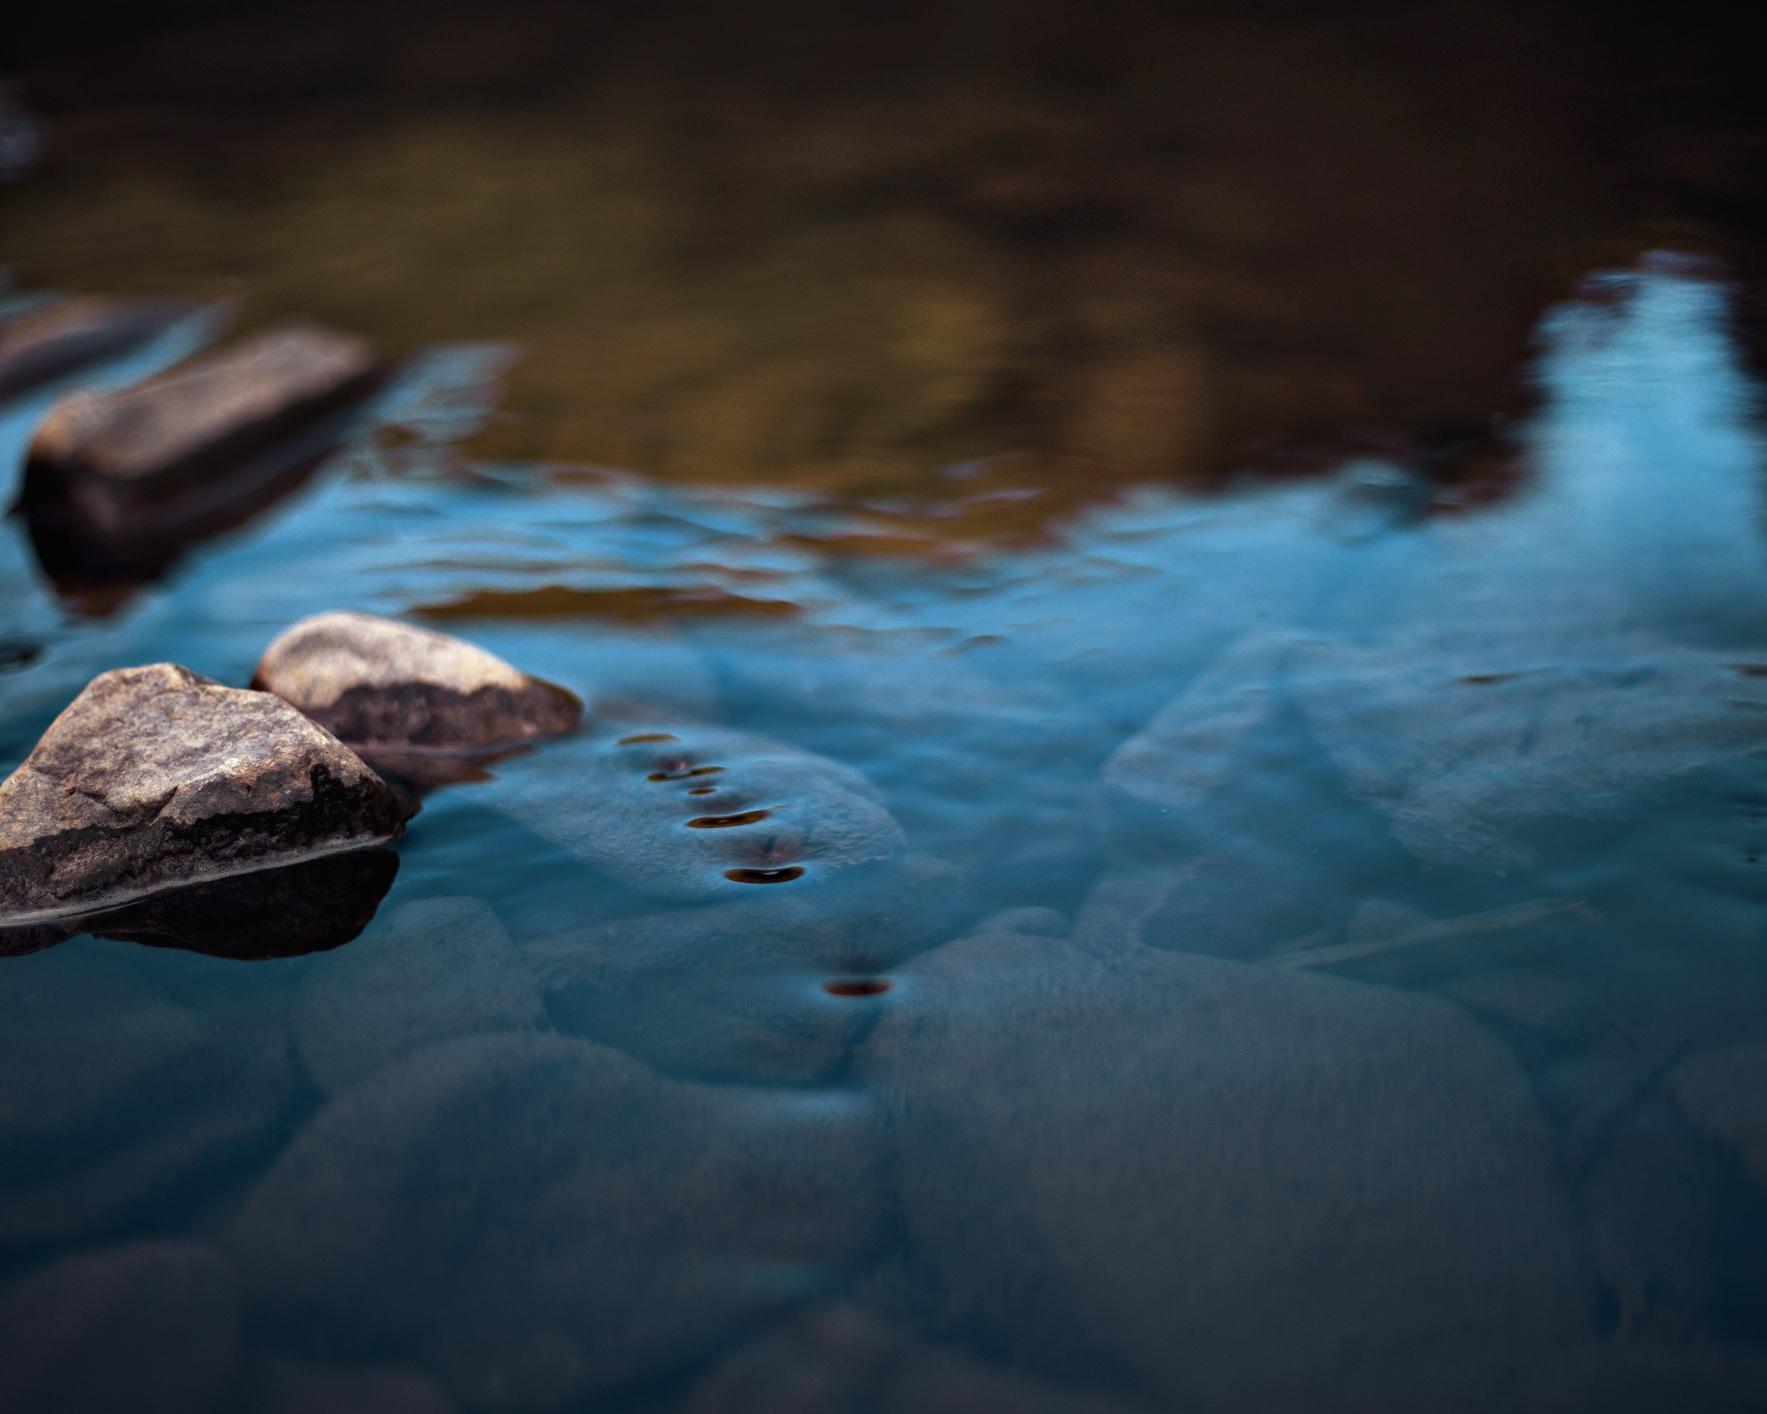 The Nature Conservancy, Oregon - Oregon, 2015Willamette Confluence Floodplain Restoration and Reconnection